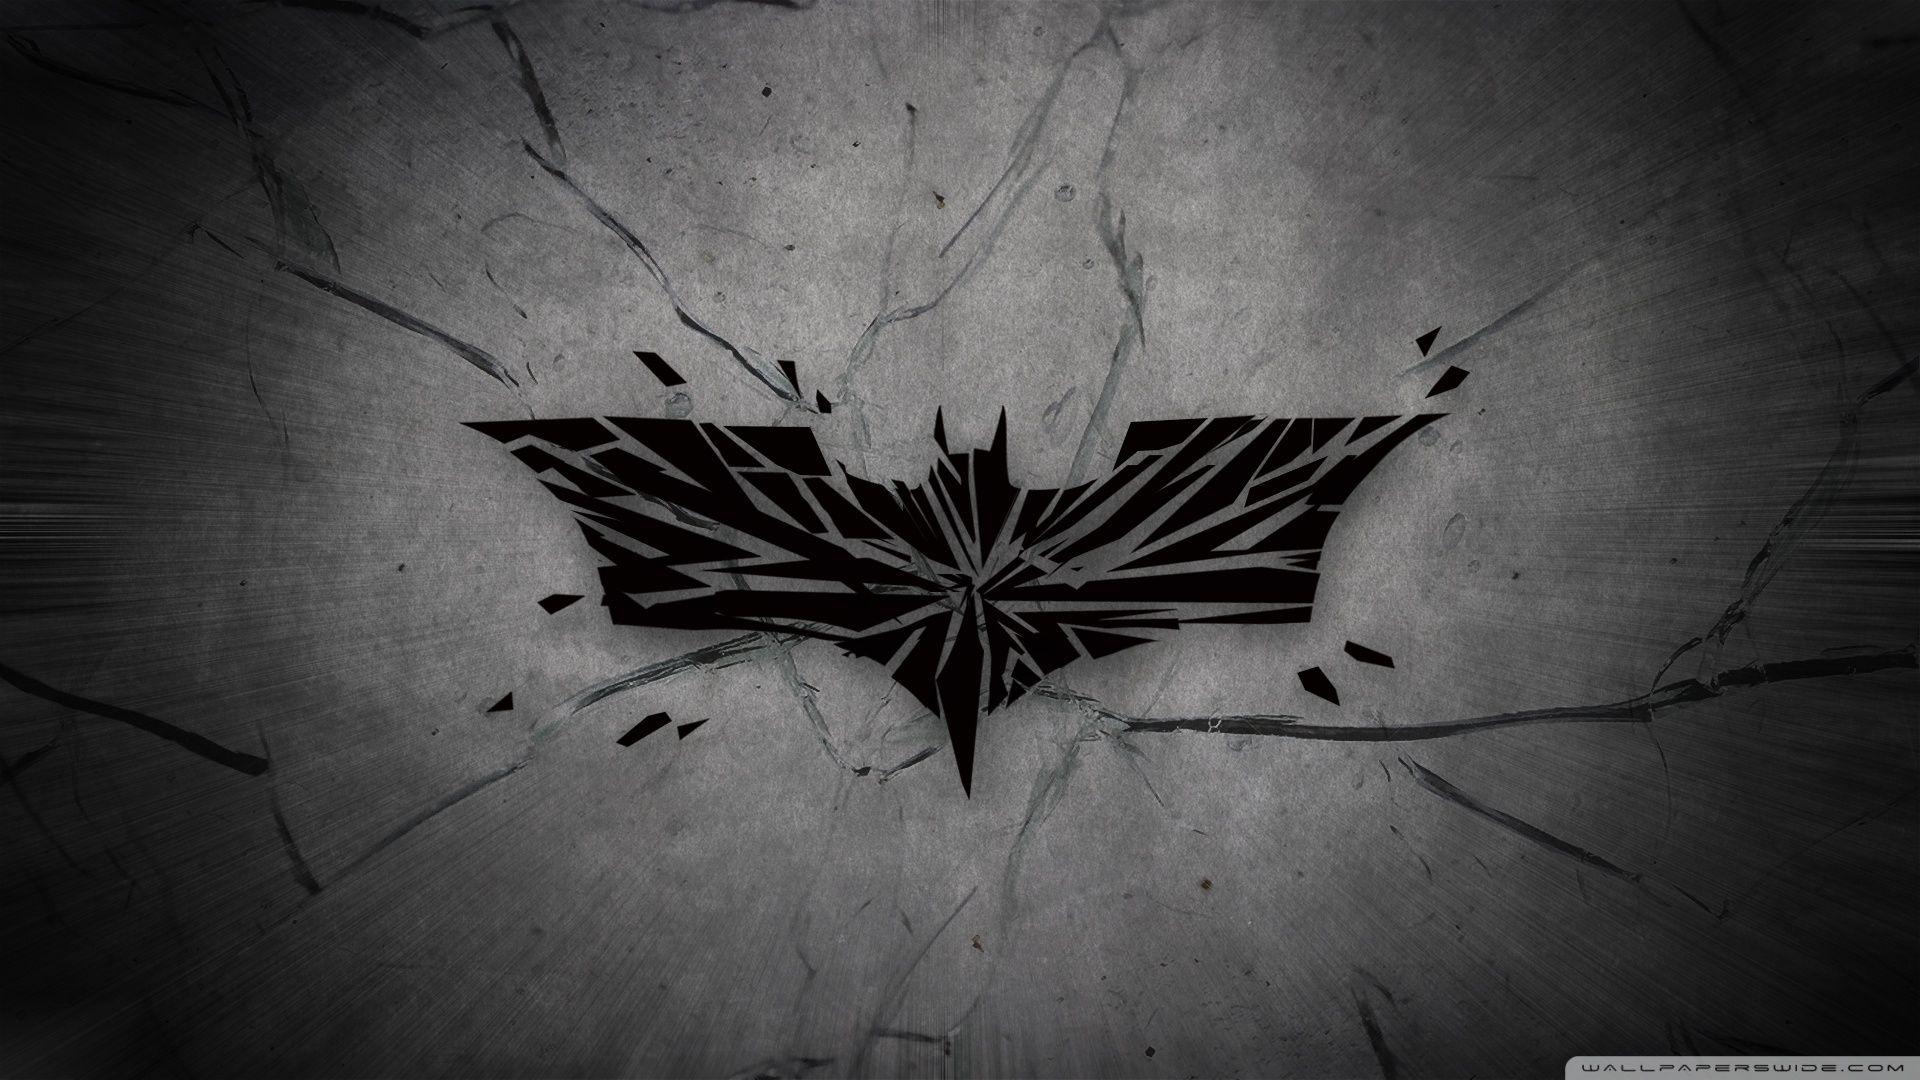 10 Most Popular Batman Hd Wallpapers 1080p Full Hd 1920 1080 For Pc Background Batman Wallpaper Hd Batman Wallpaper Logo Wallpaper Hd